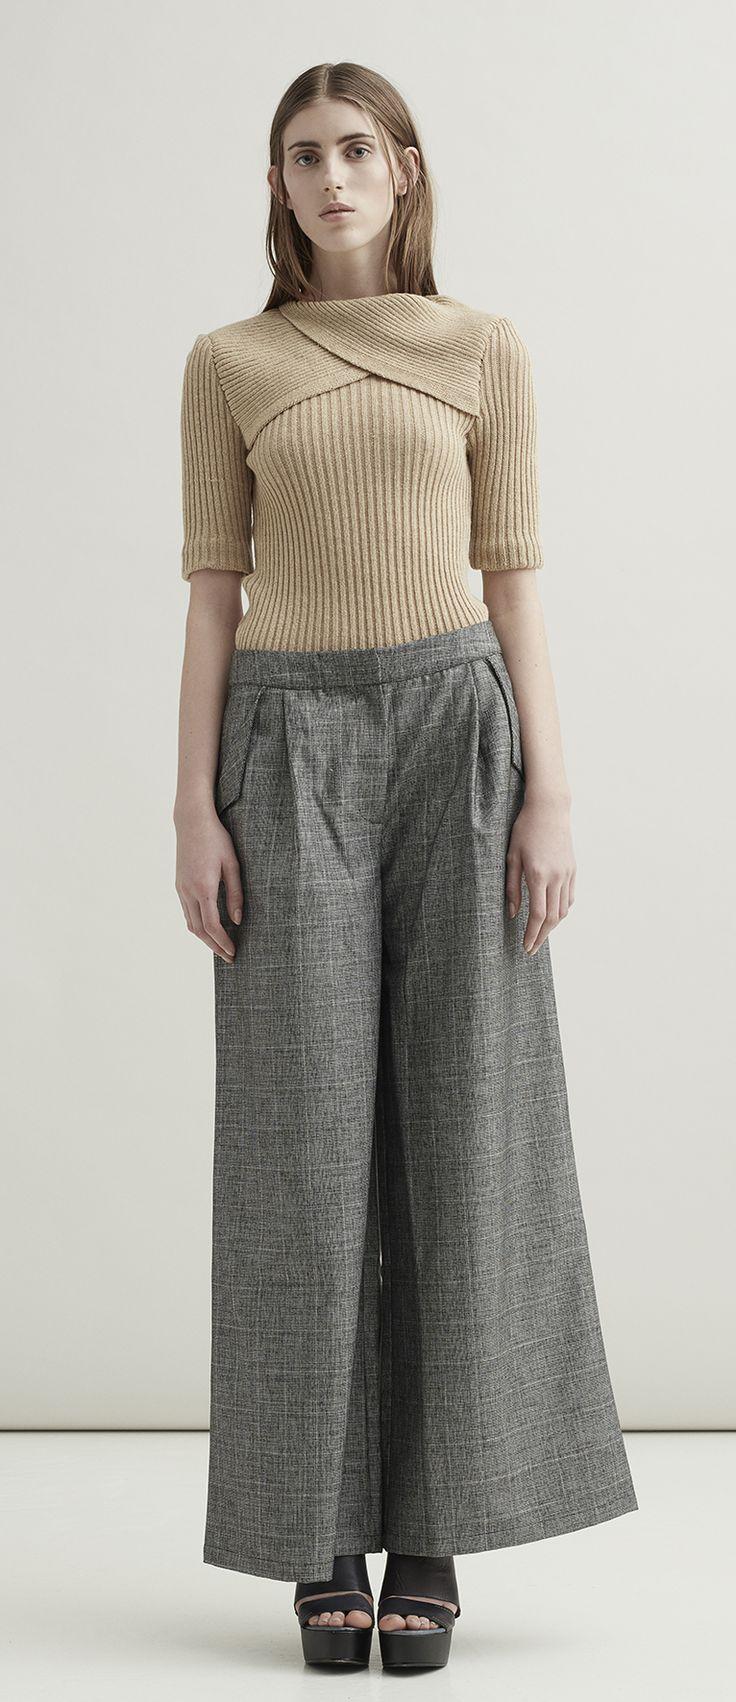 Stine Ladefoged AW16 Image Campaign, Scandinavian design, fashion, knit